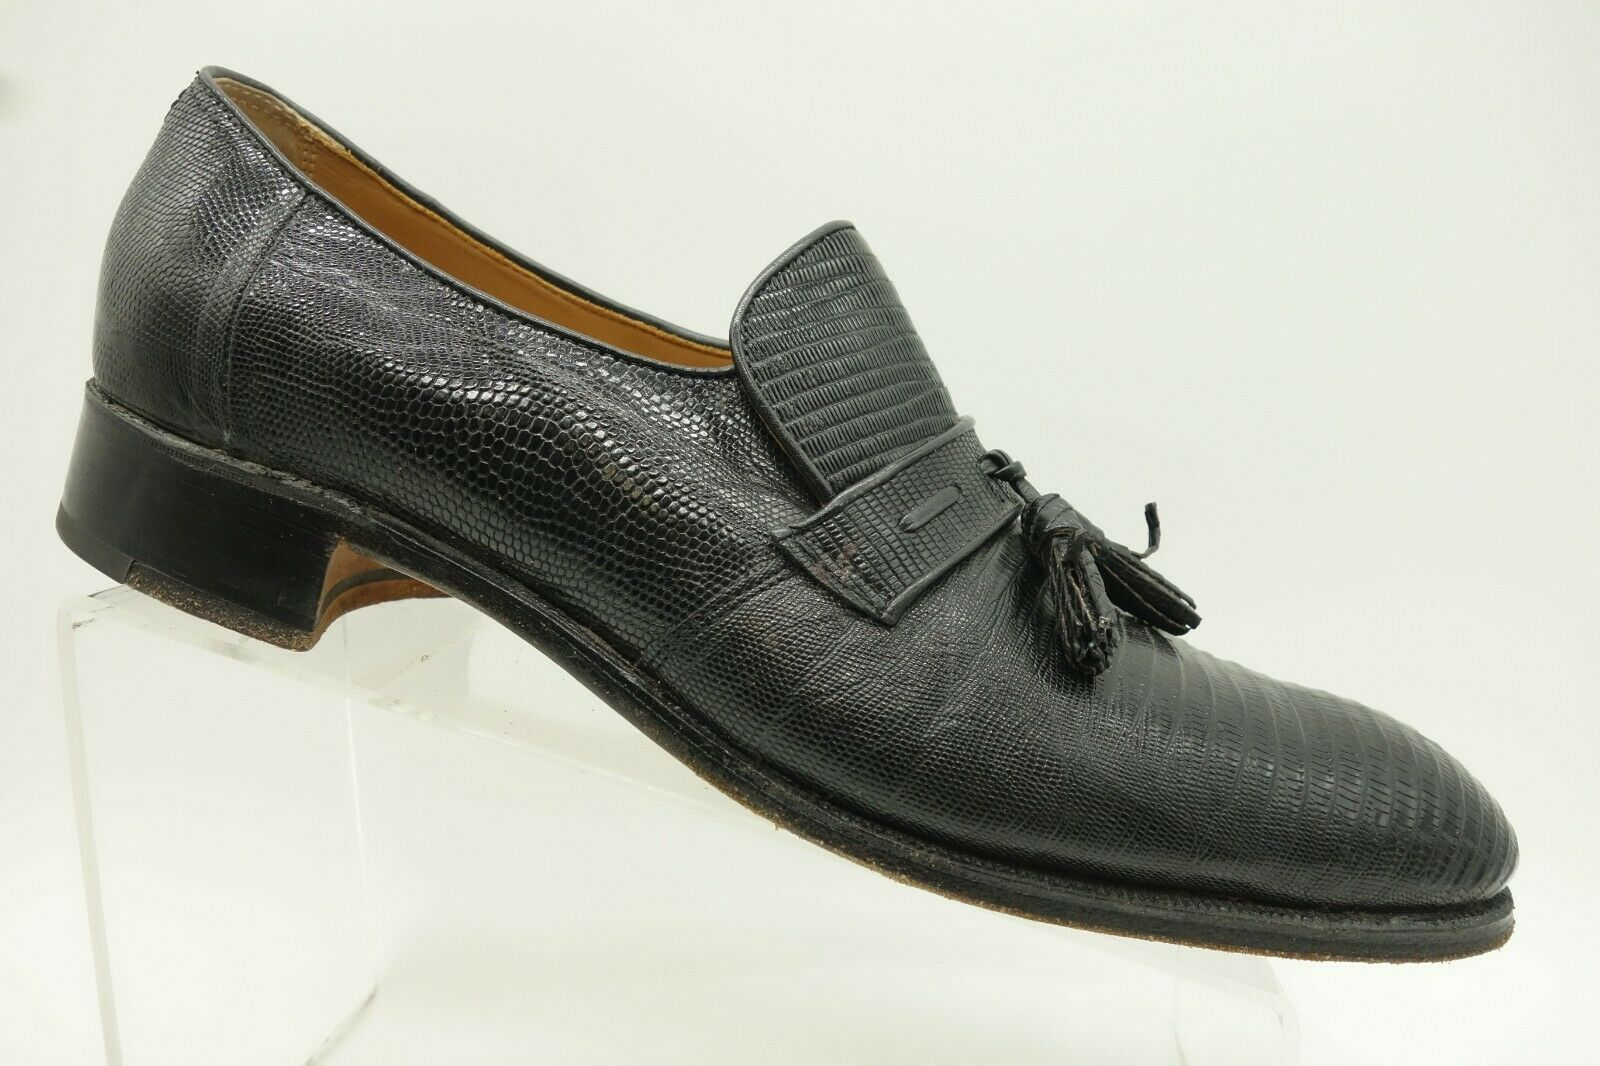 presa Nettleton Nettleton Nettleton USA nero Lizard Skin Leather Tassel Loafer scarpe Uomo 10.5 B   2A  vendita calda online